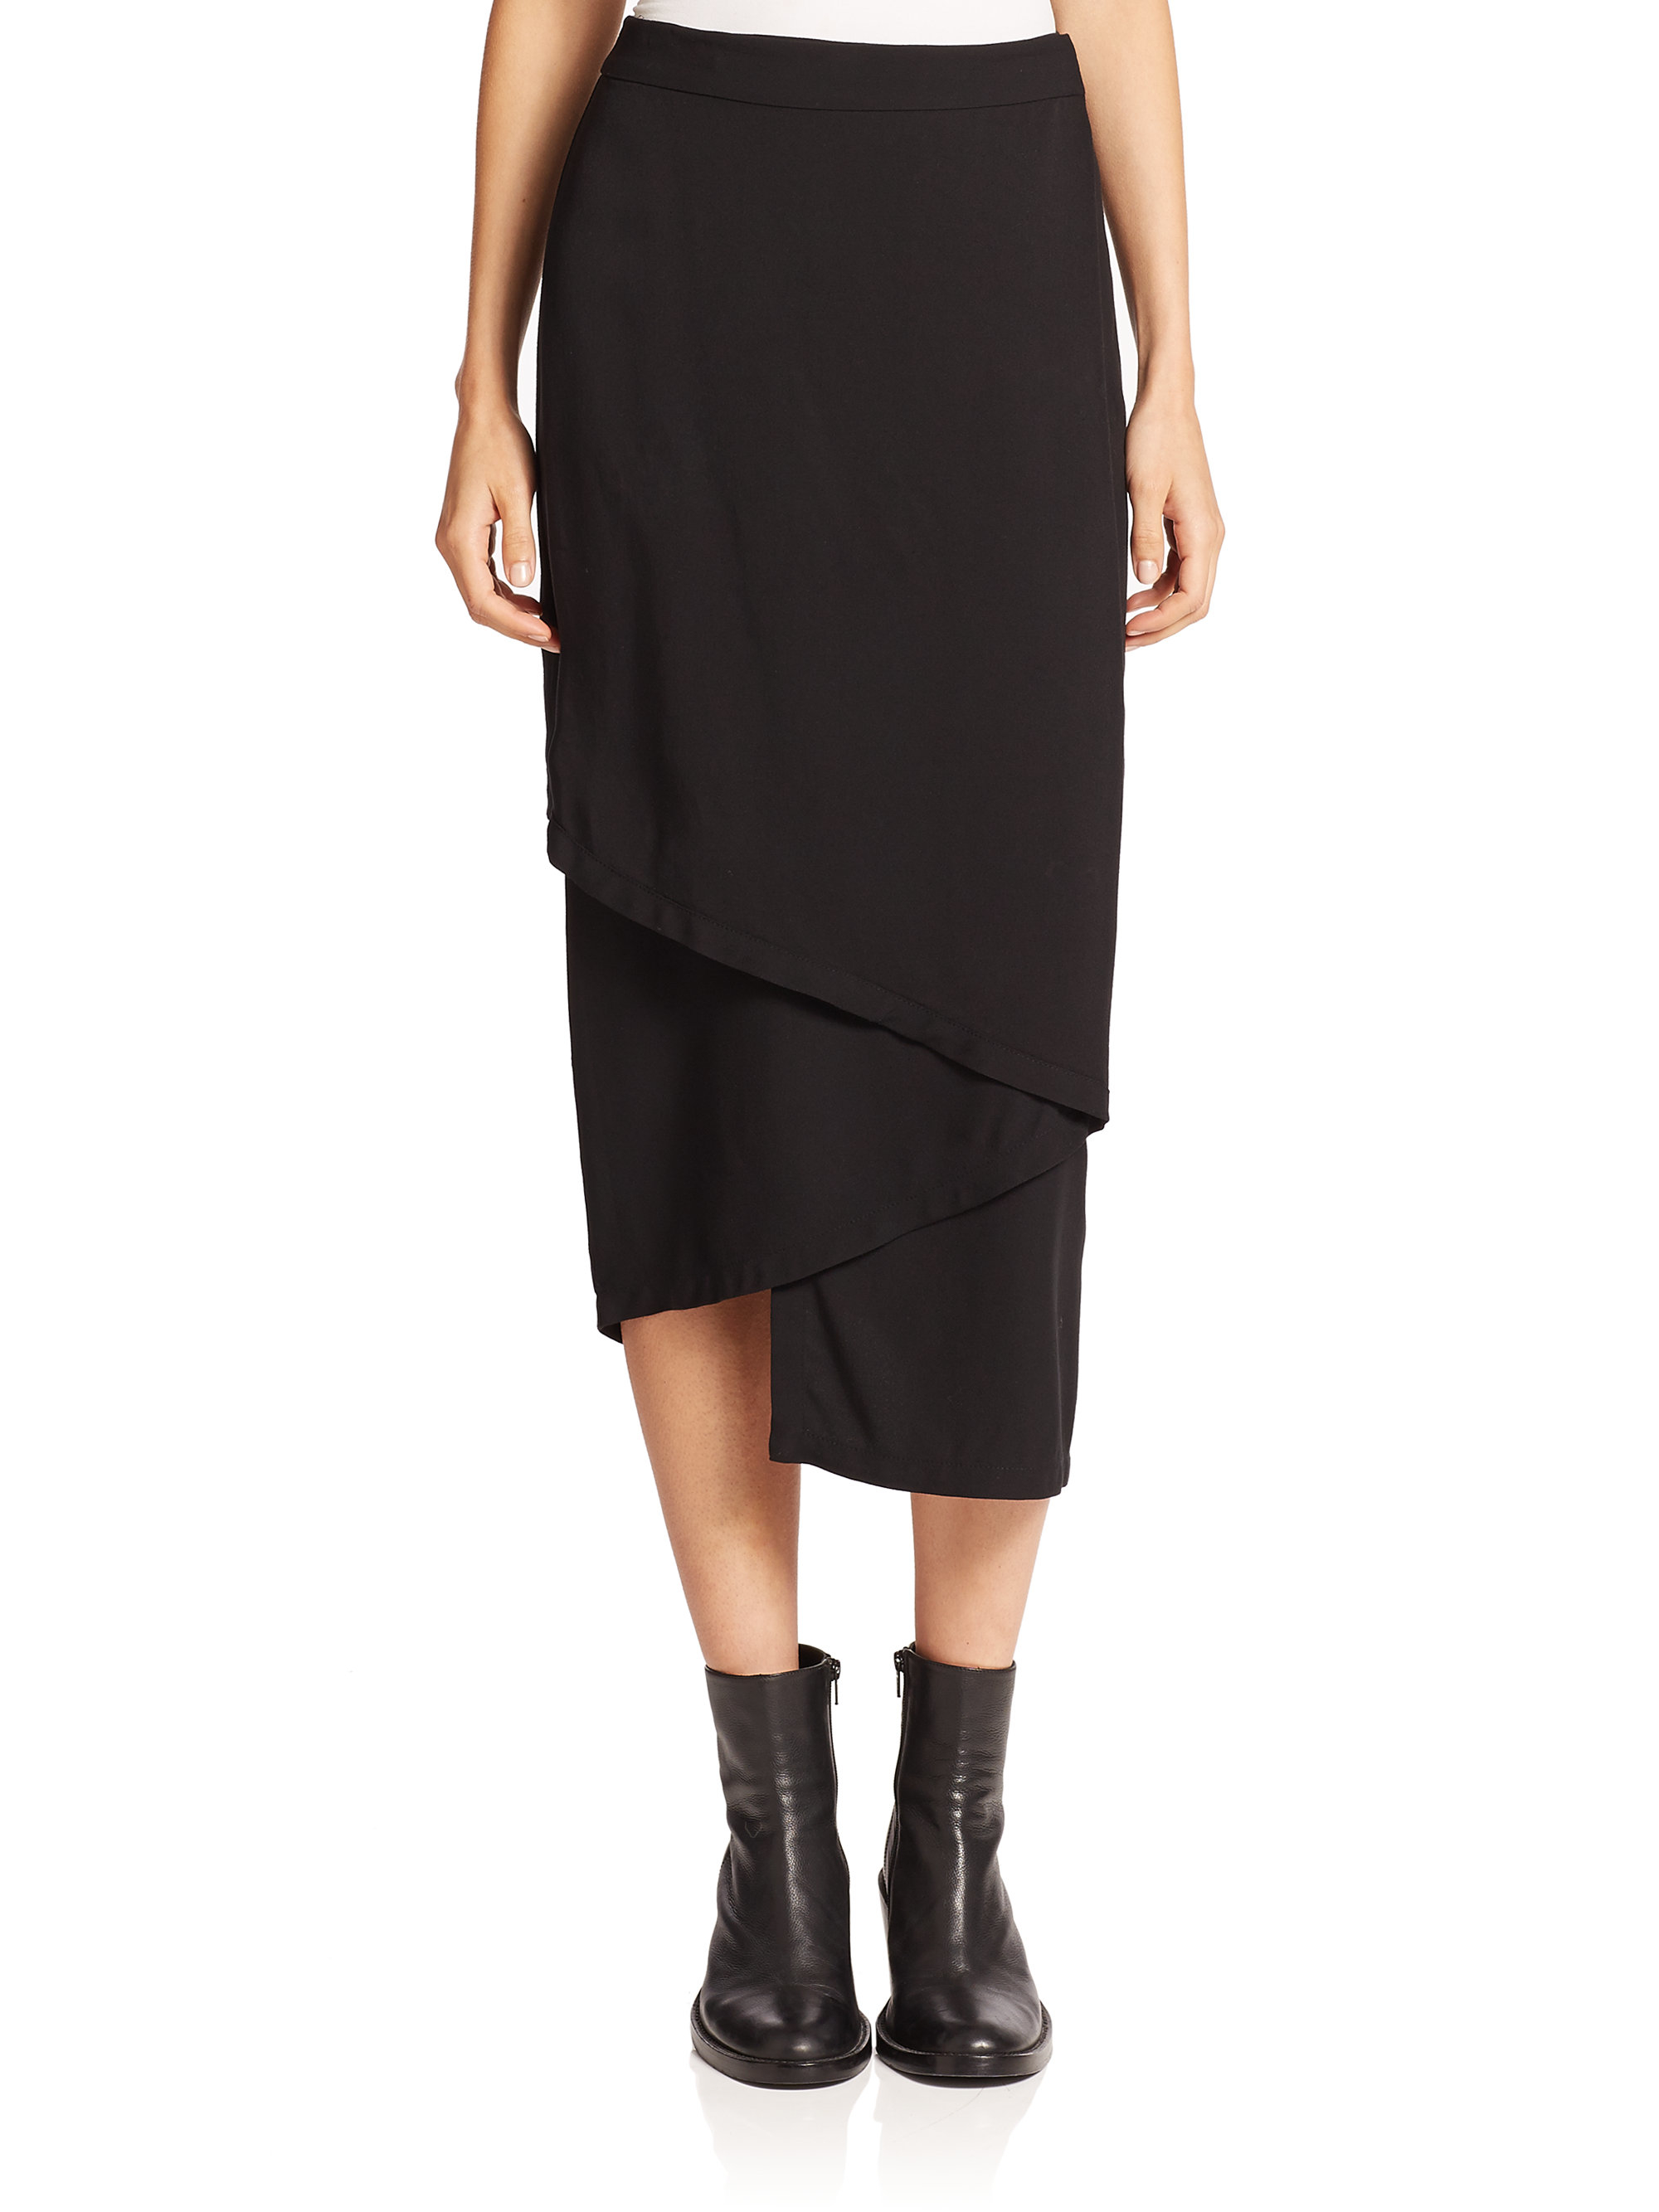 Dkny Midi Wrap Skirt in Black | Lyst